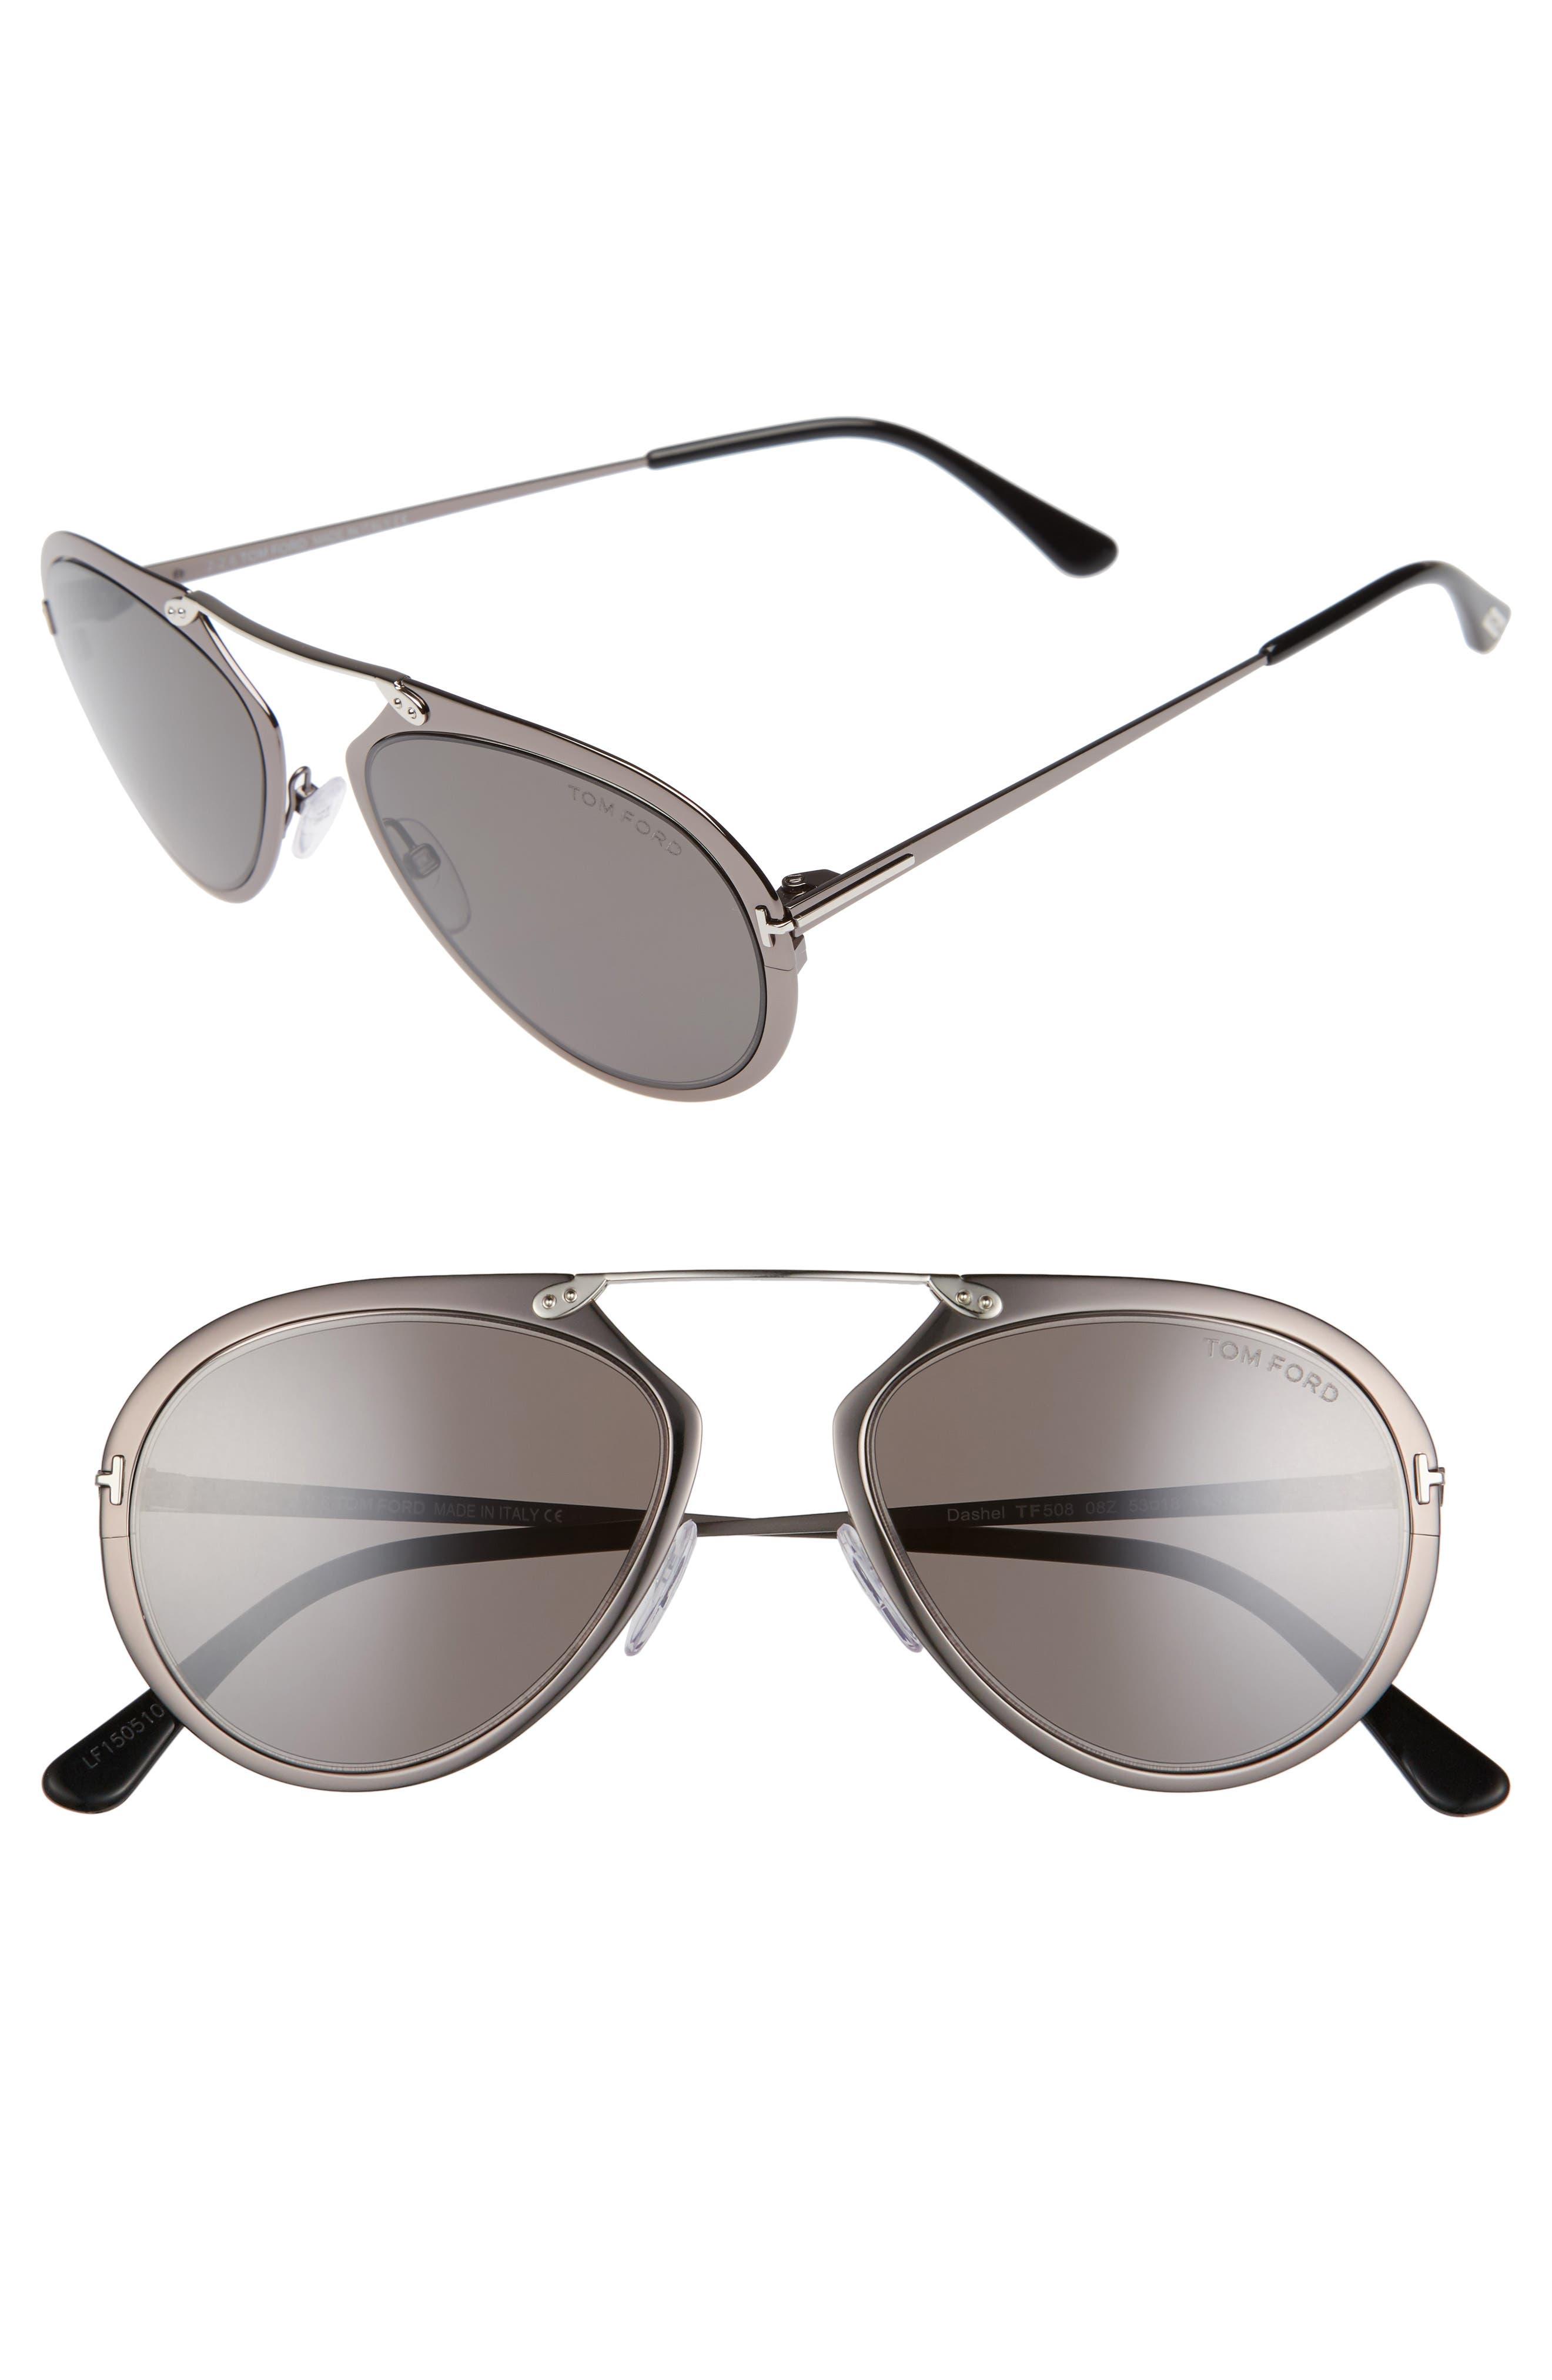 Tom Ford Dashel 58mm Aviator Sunglasses